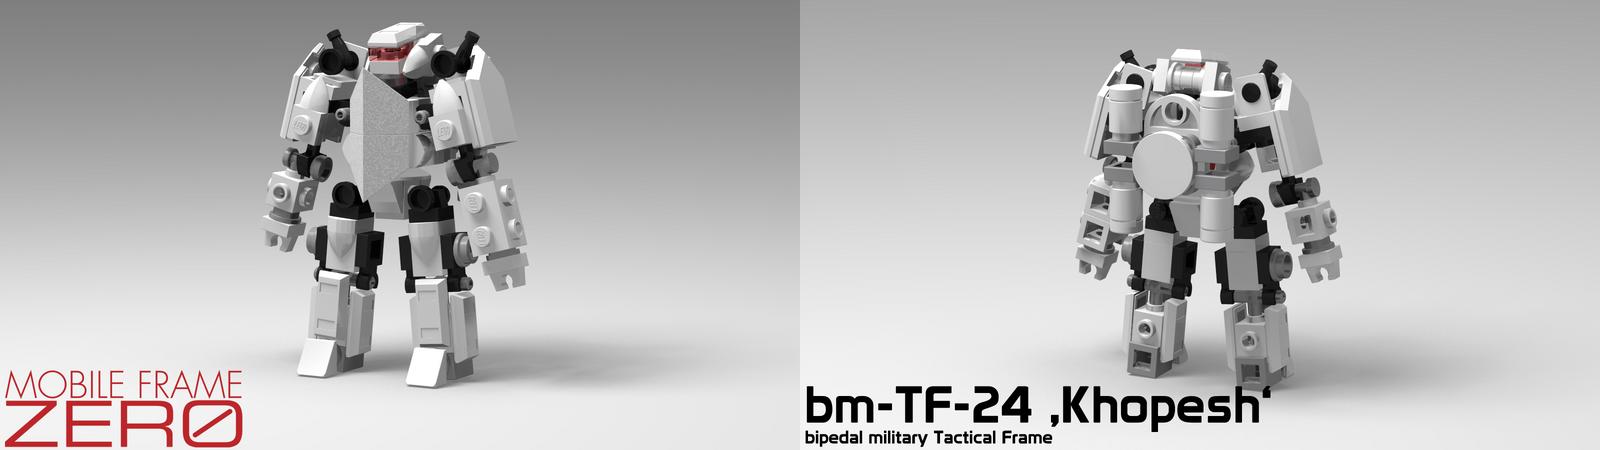 Mobile Frame Zero - bm-TF-24 'Khopesh' by StargazeAndSundance